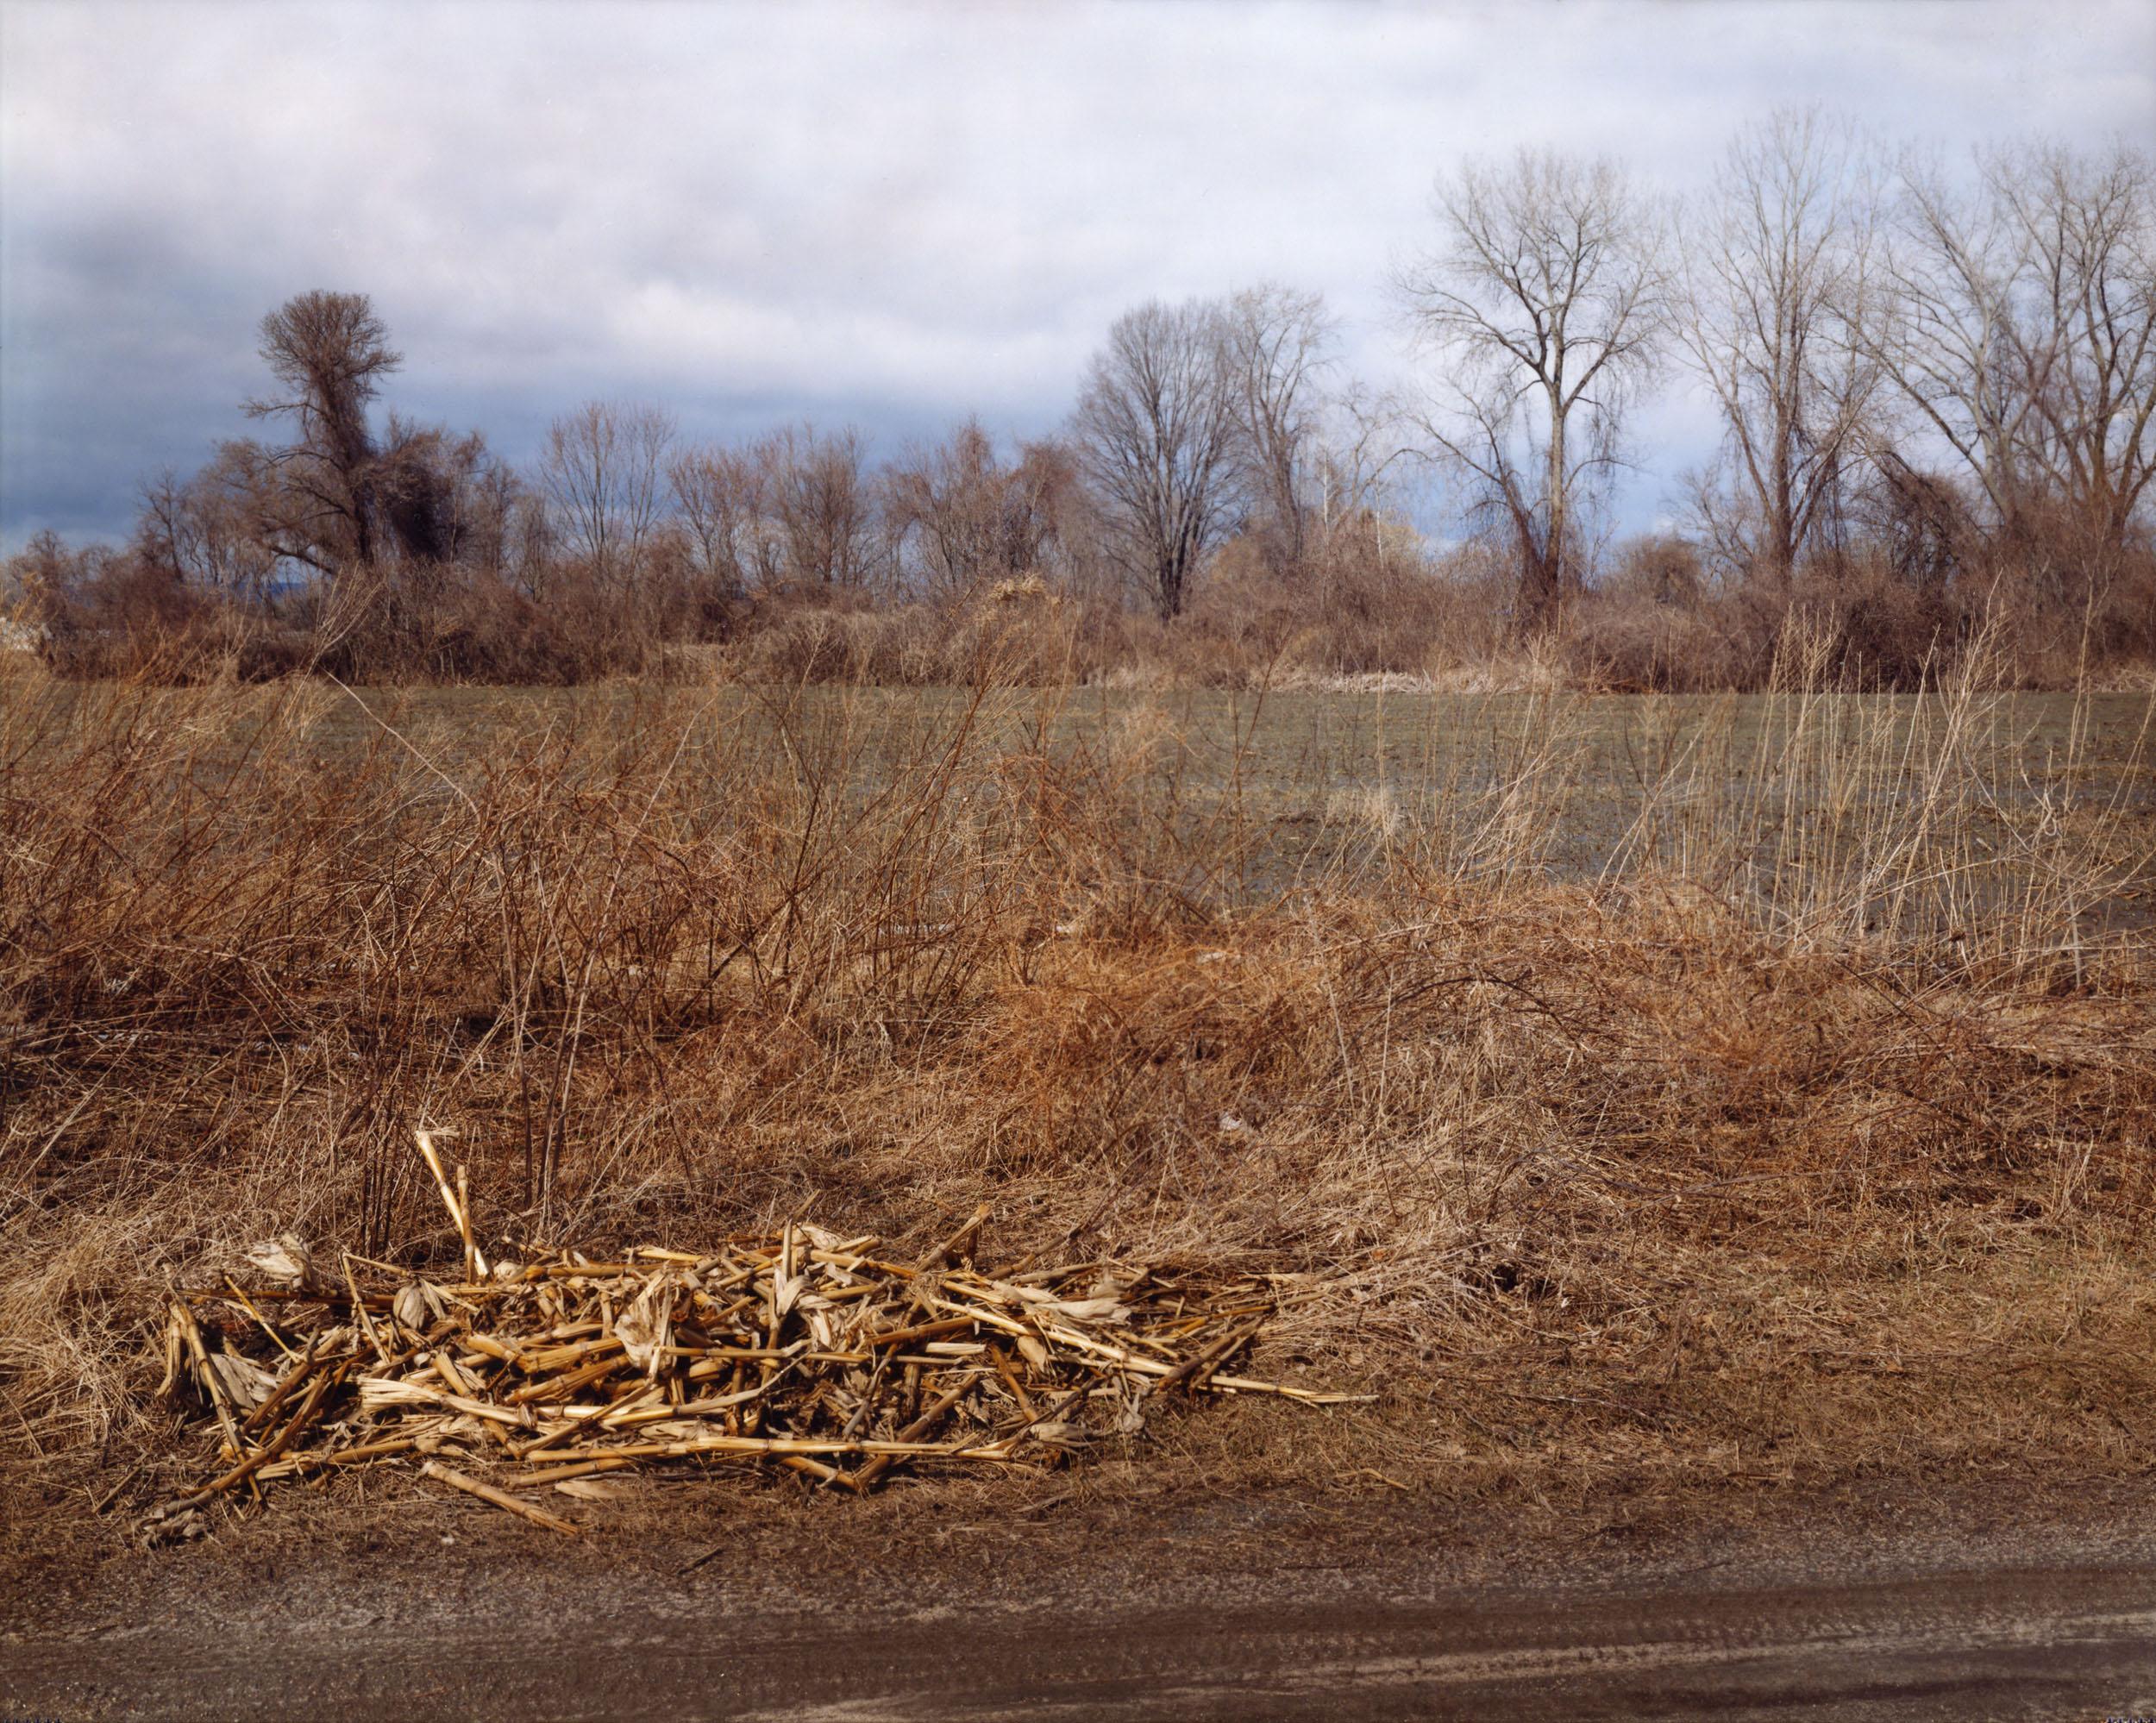 The East Meadows, Northampton, Massachusetts, April 16, 2006